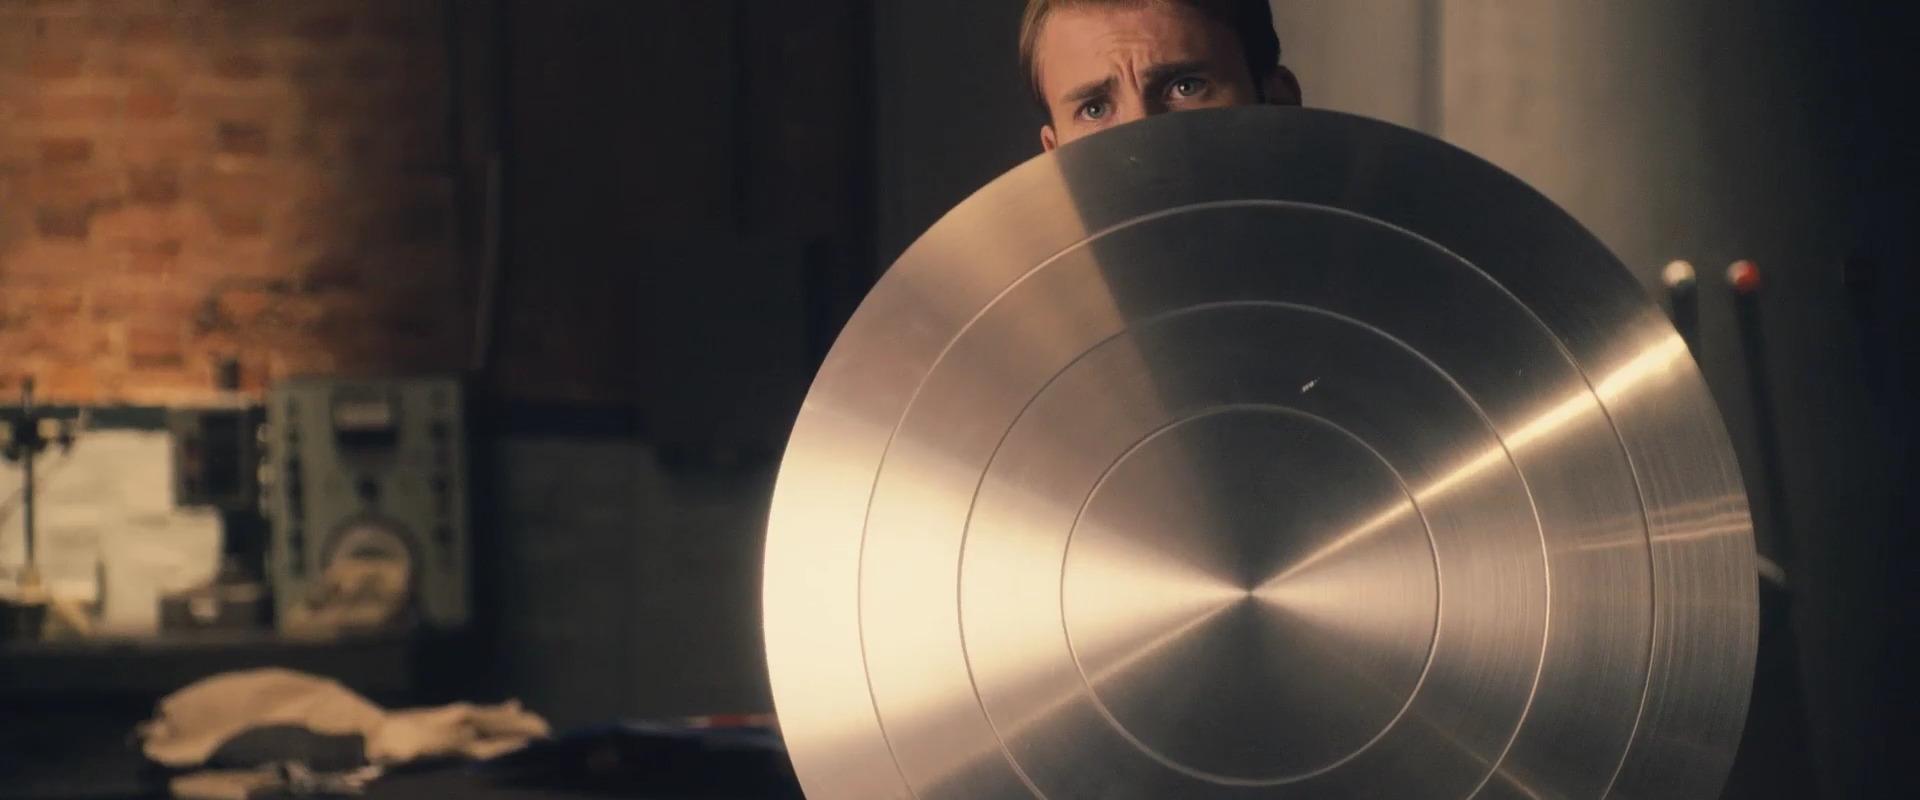 Captain America trailer screencaps